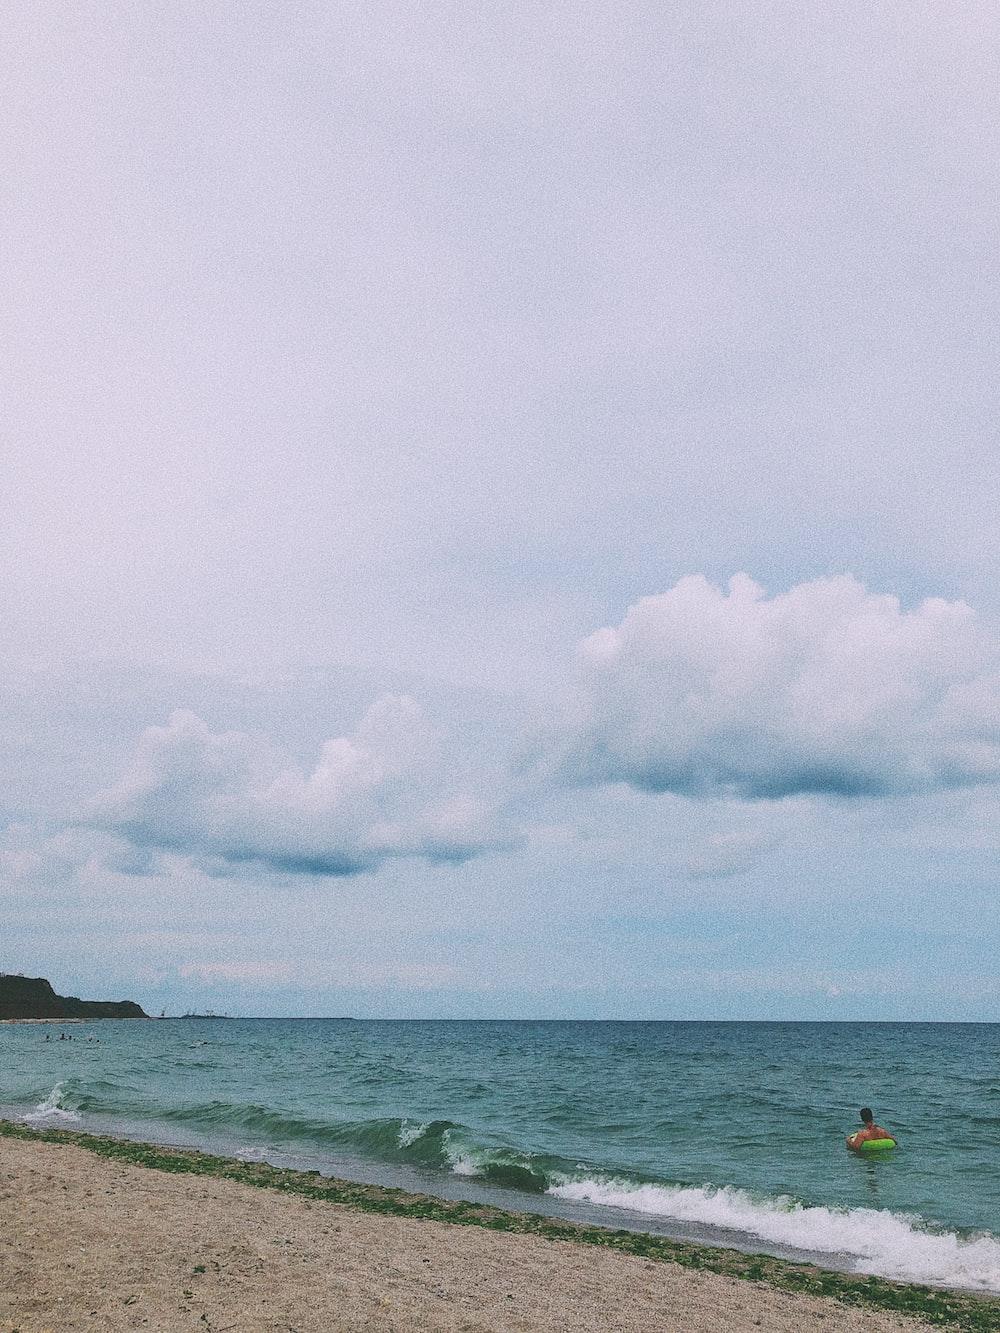 sea under cloudy sky